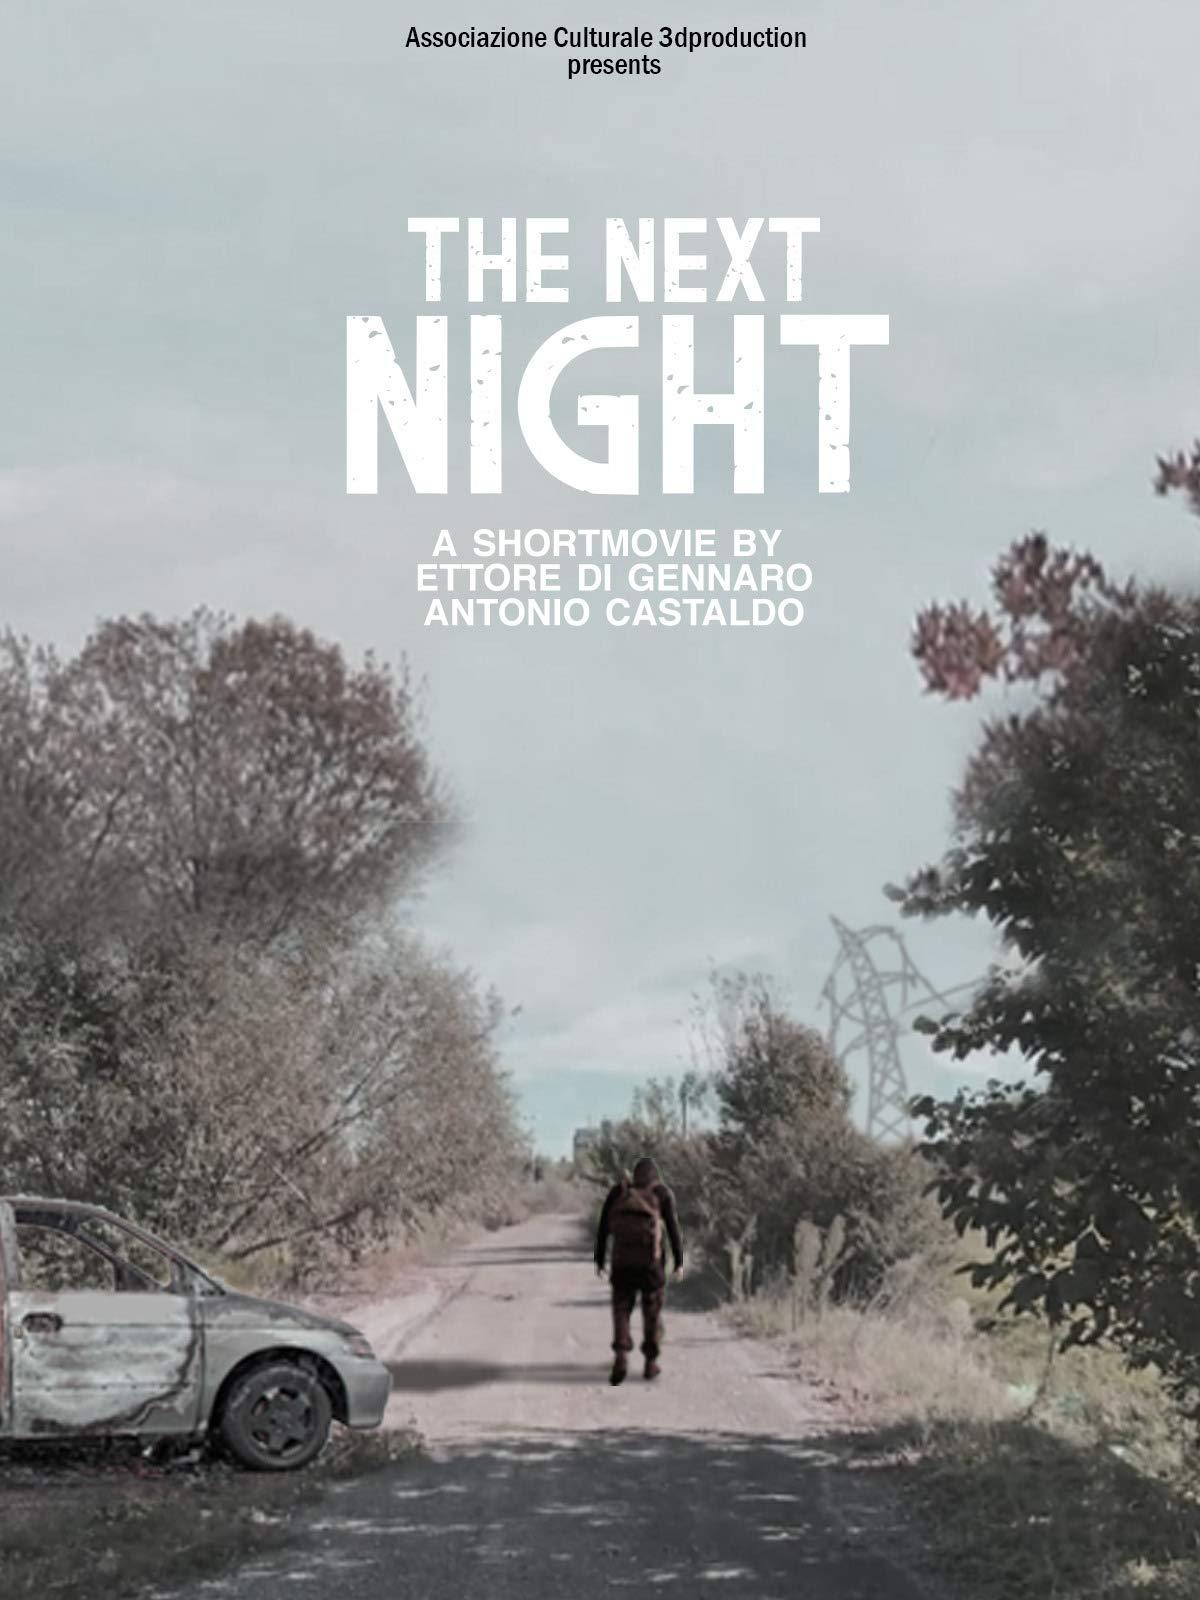 The next night